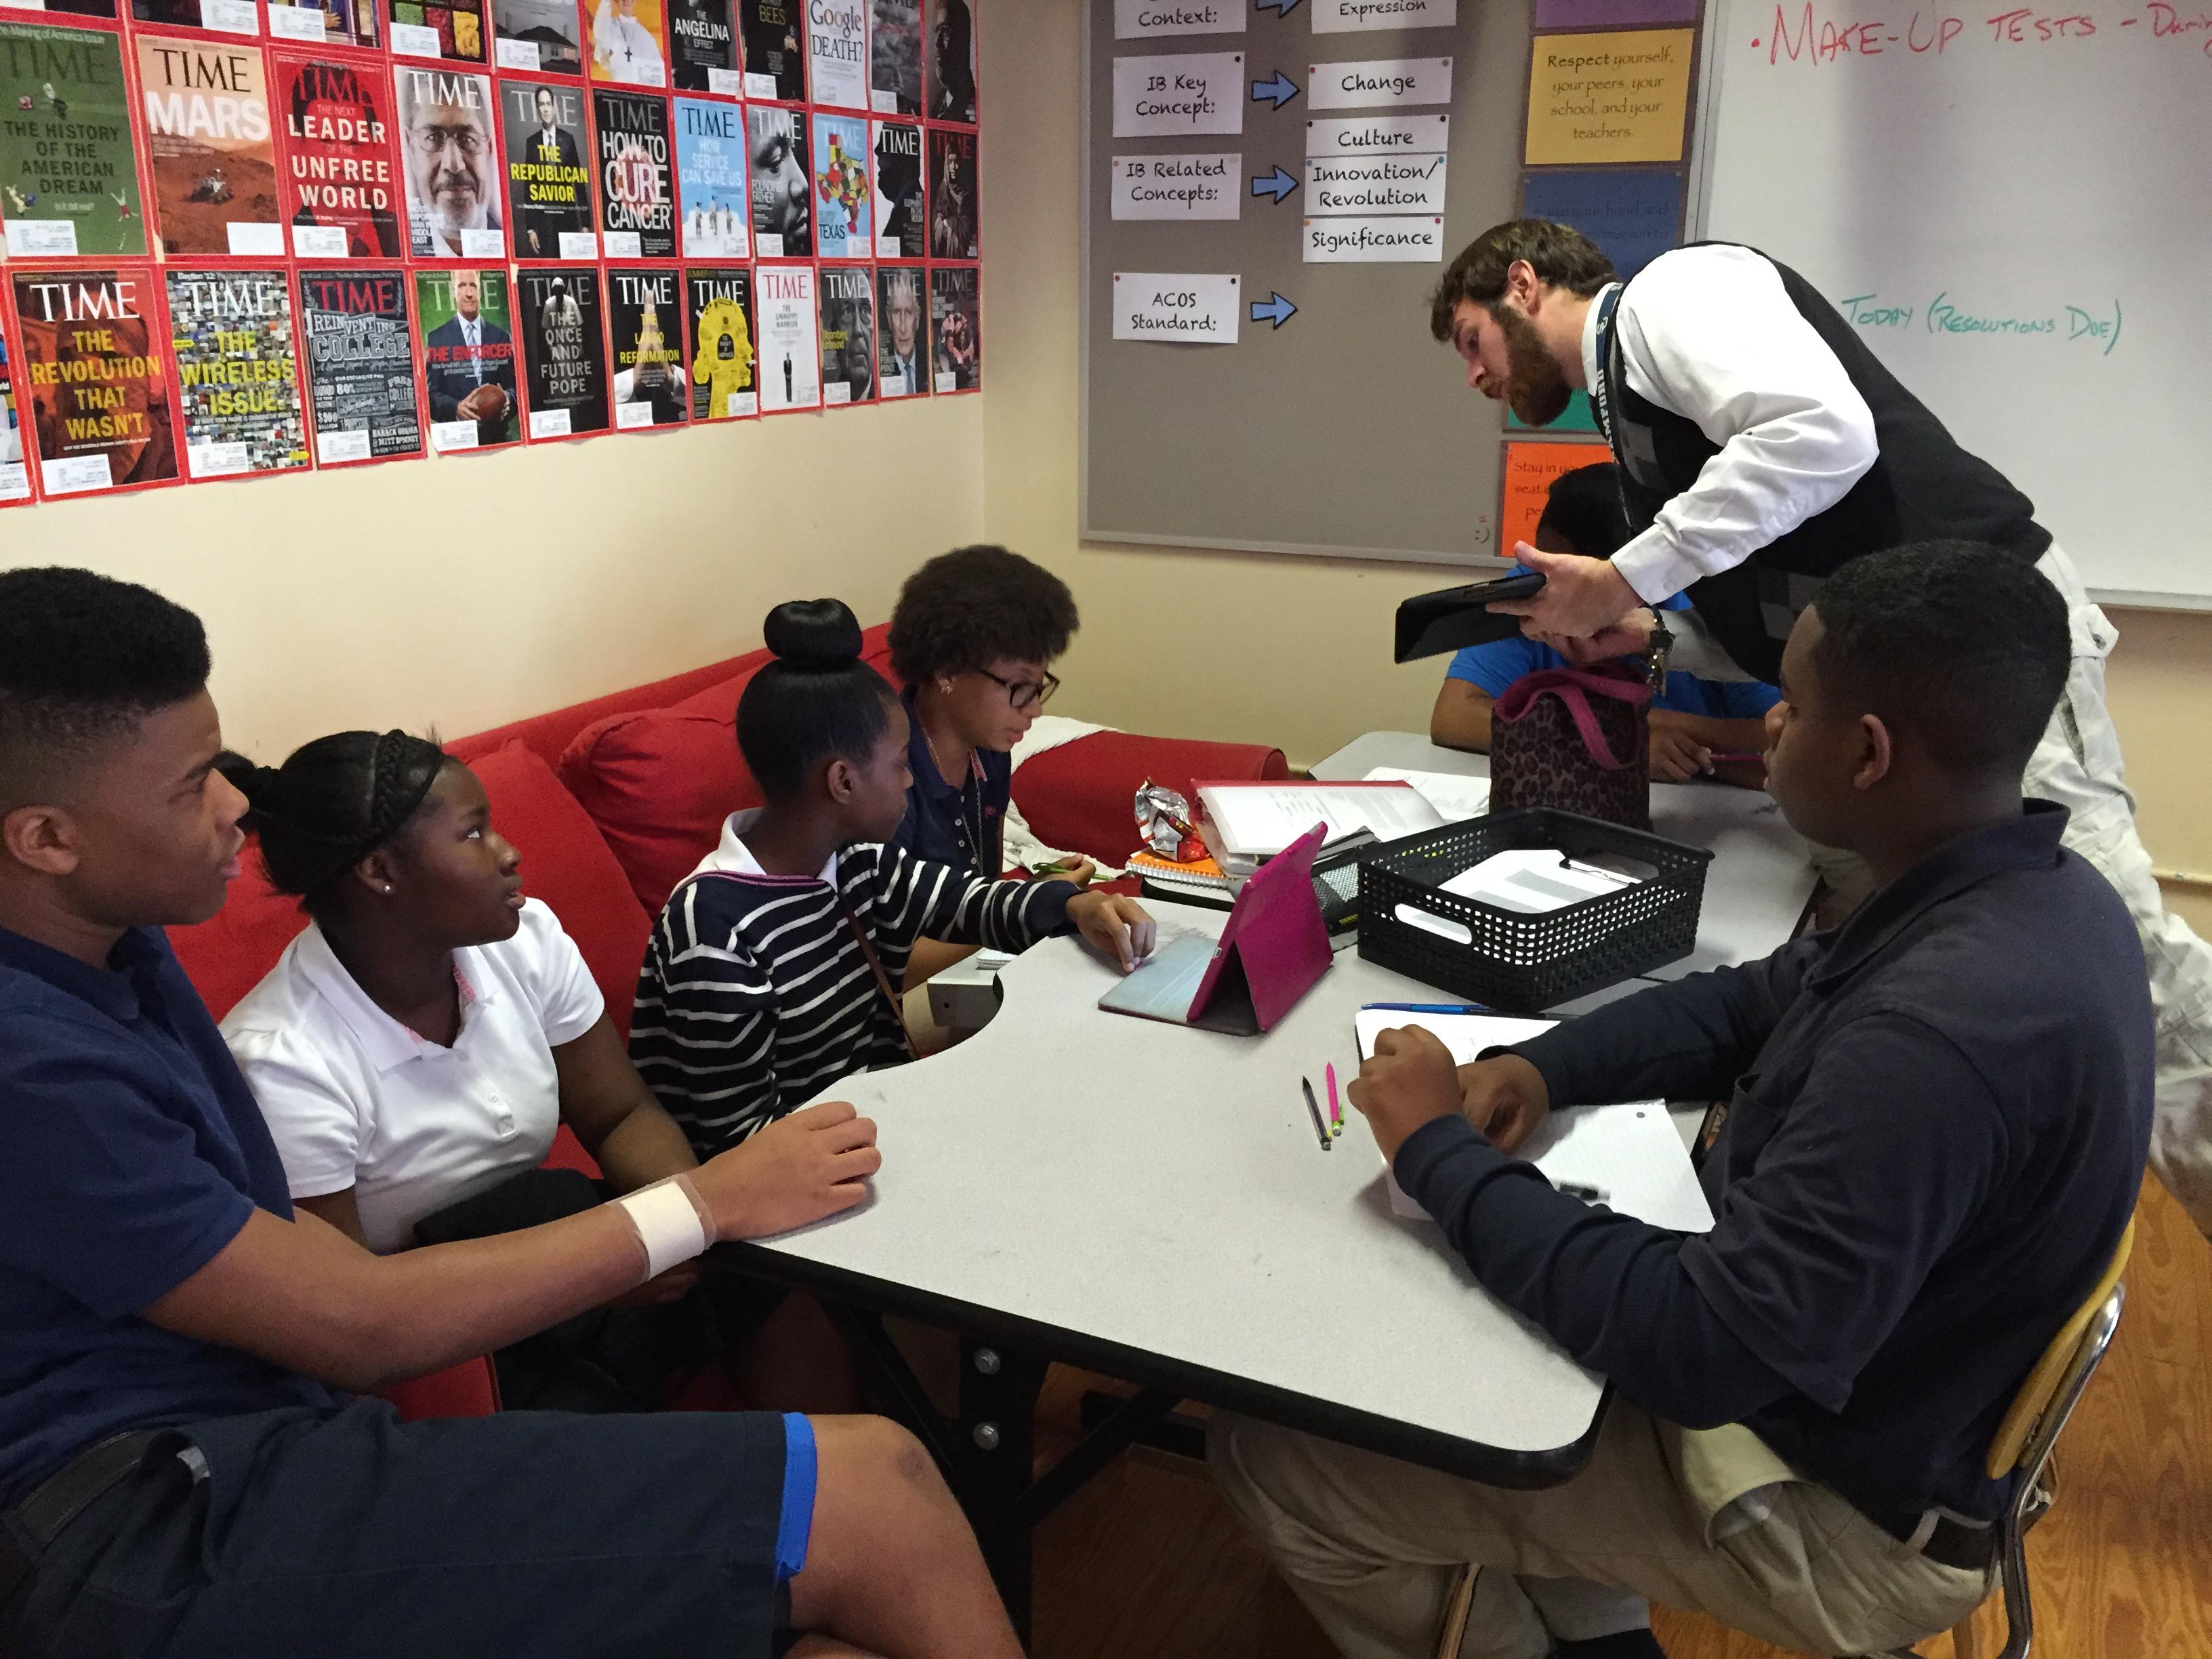 Caption: Teacher John Mark Edwards uses flexibility in teaching his students at Phillips Academy in Birmingham, Alabama. , Credit: Dan Carsen, Southern Education Desk